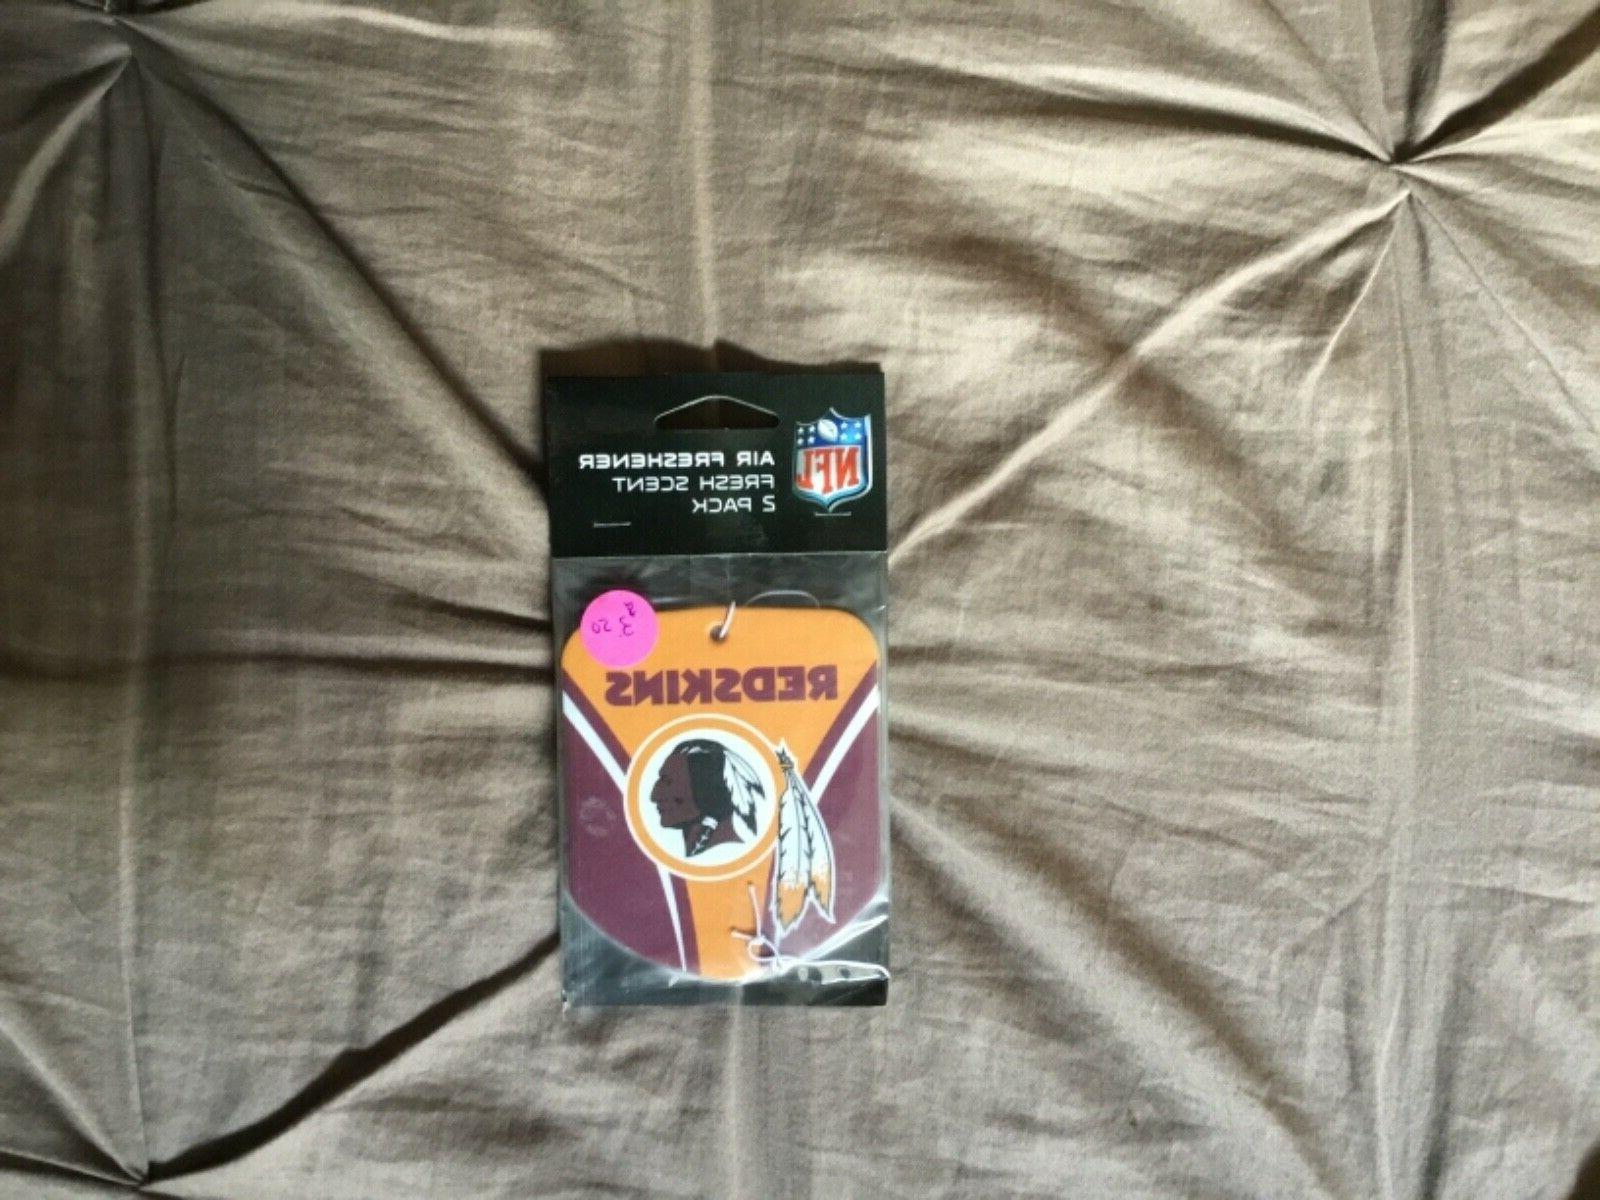 washington redskins air freshener 2 pack